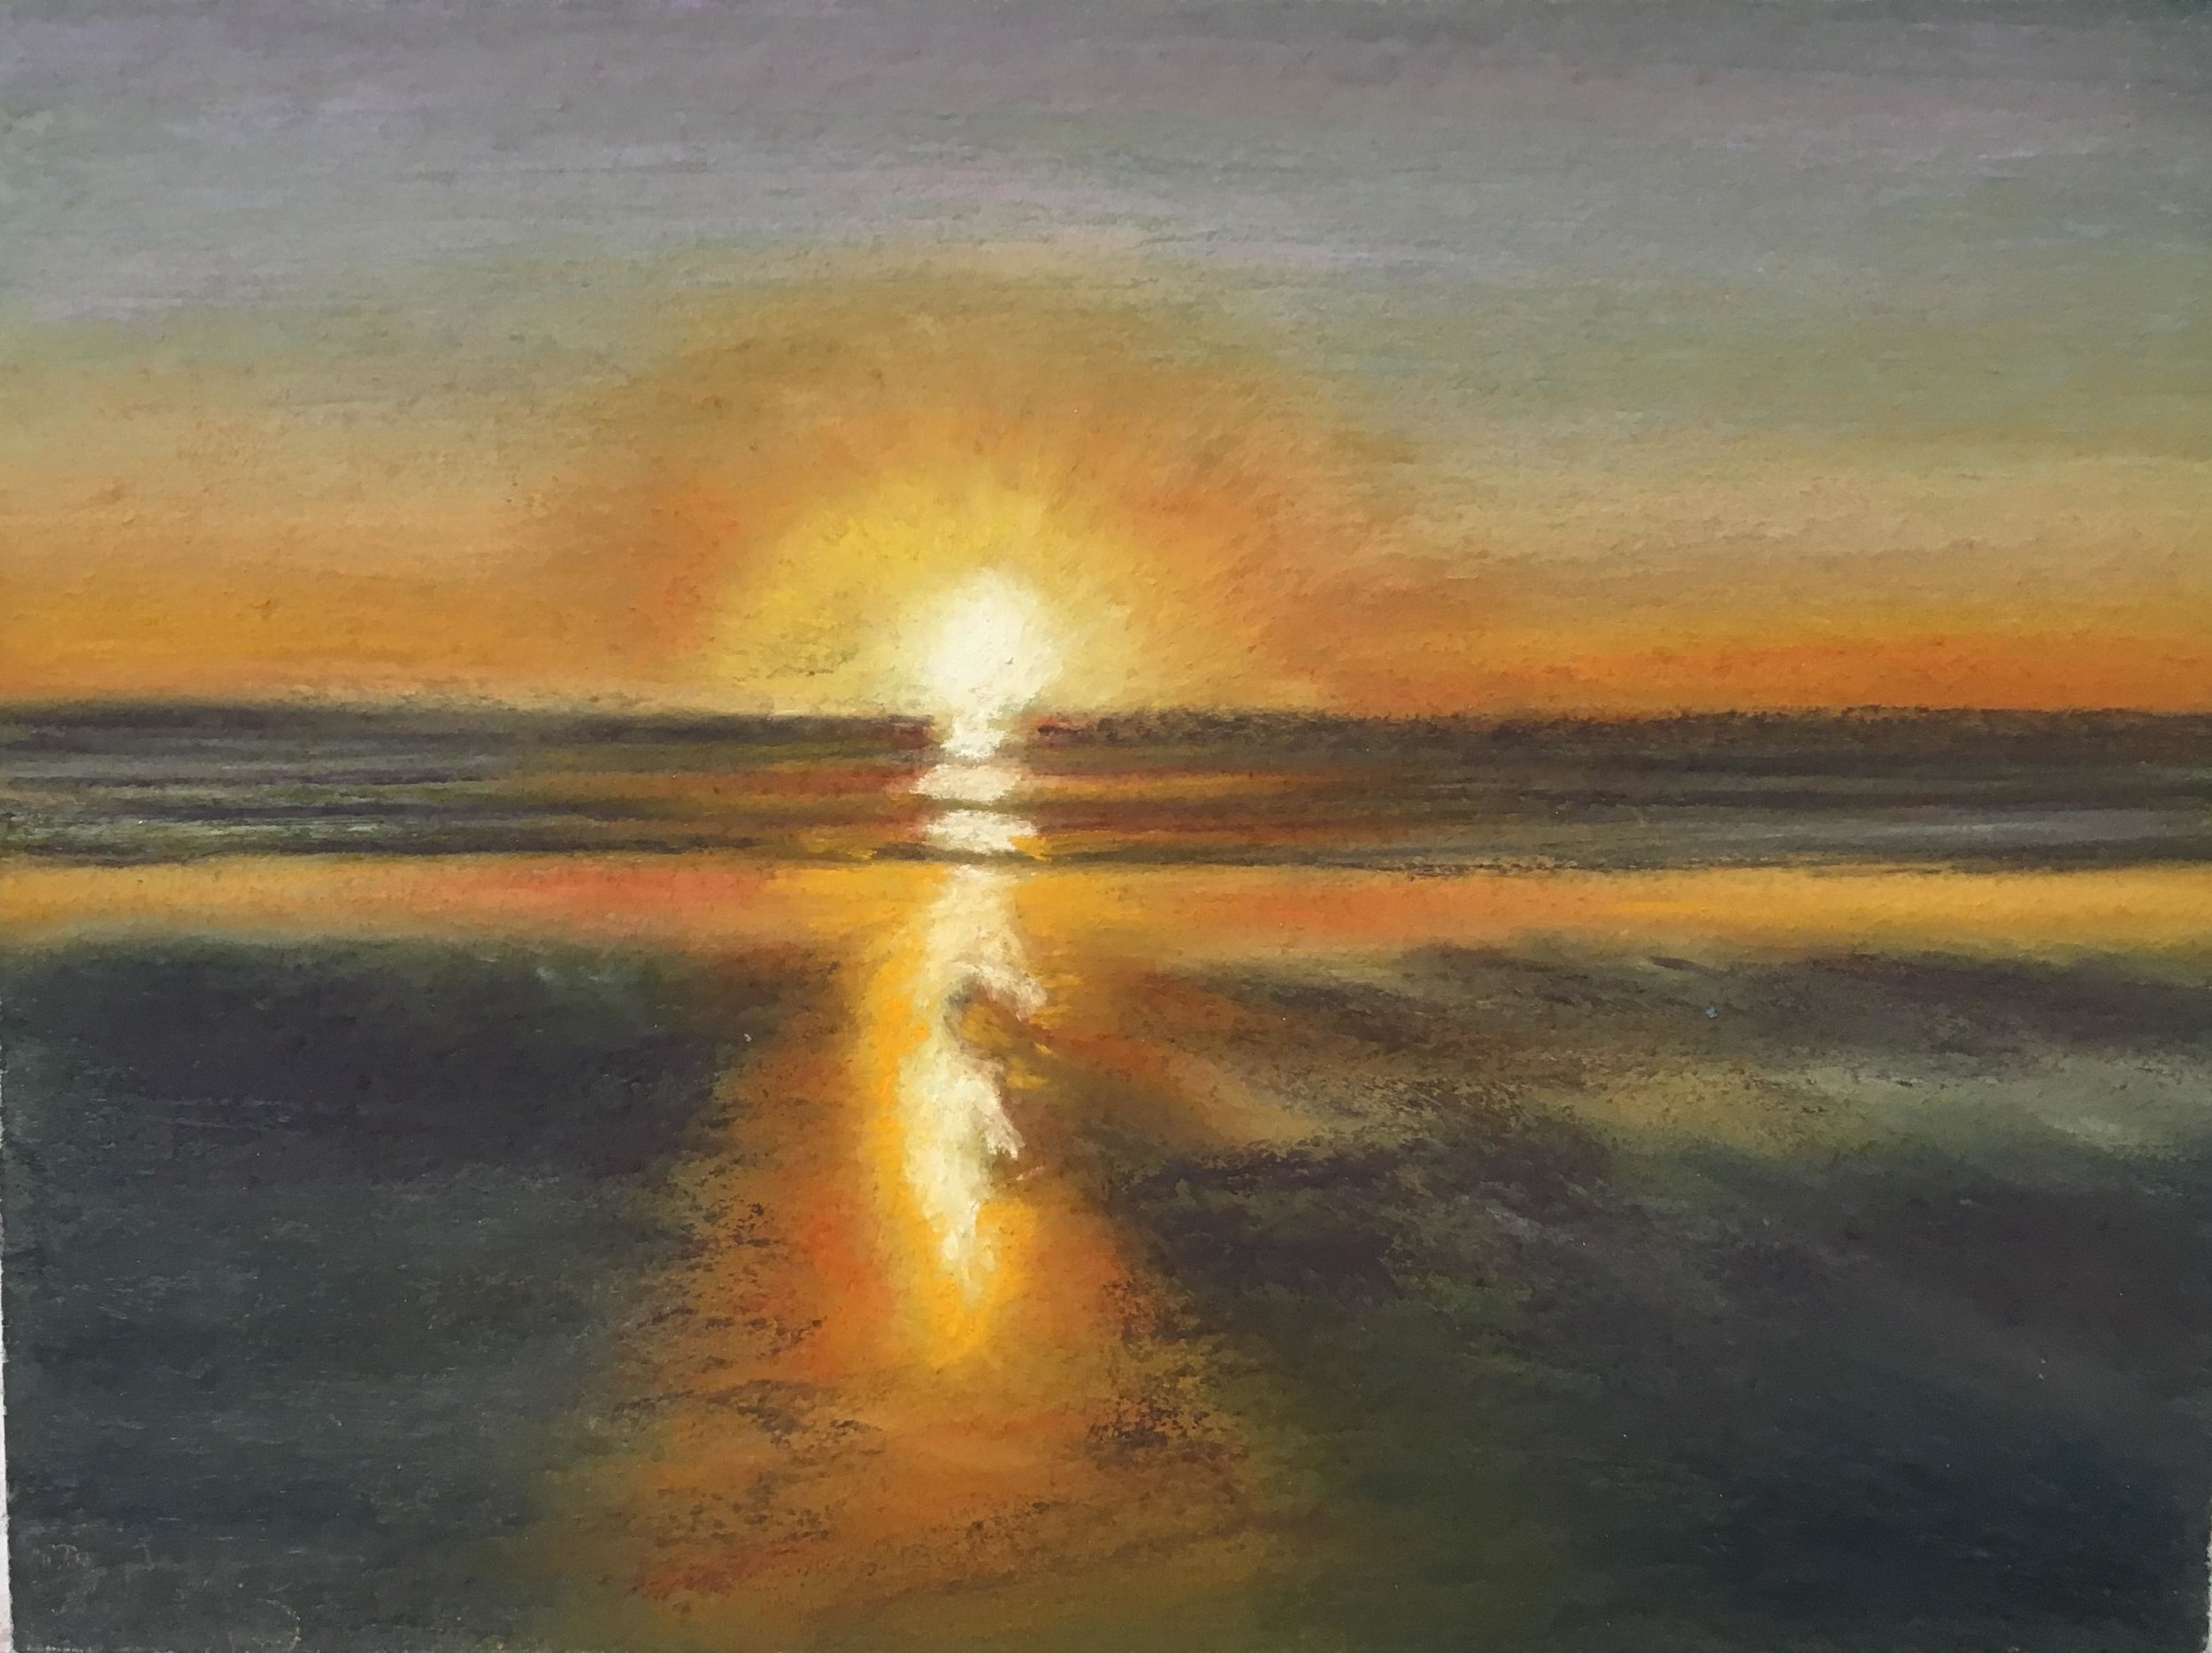 Print 16 - Sunset - Size: 265 x 198